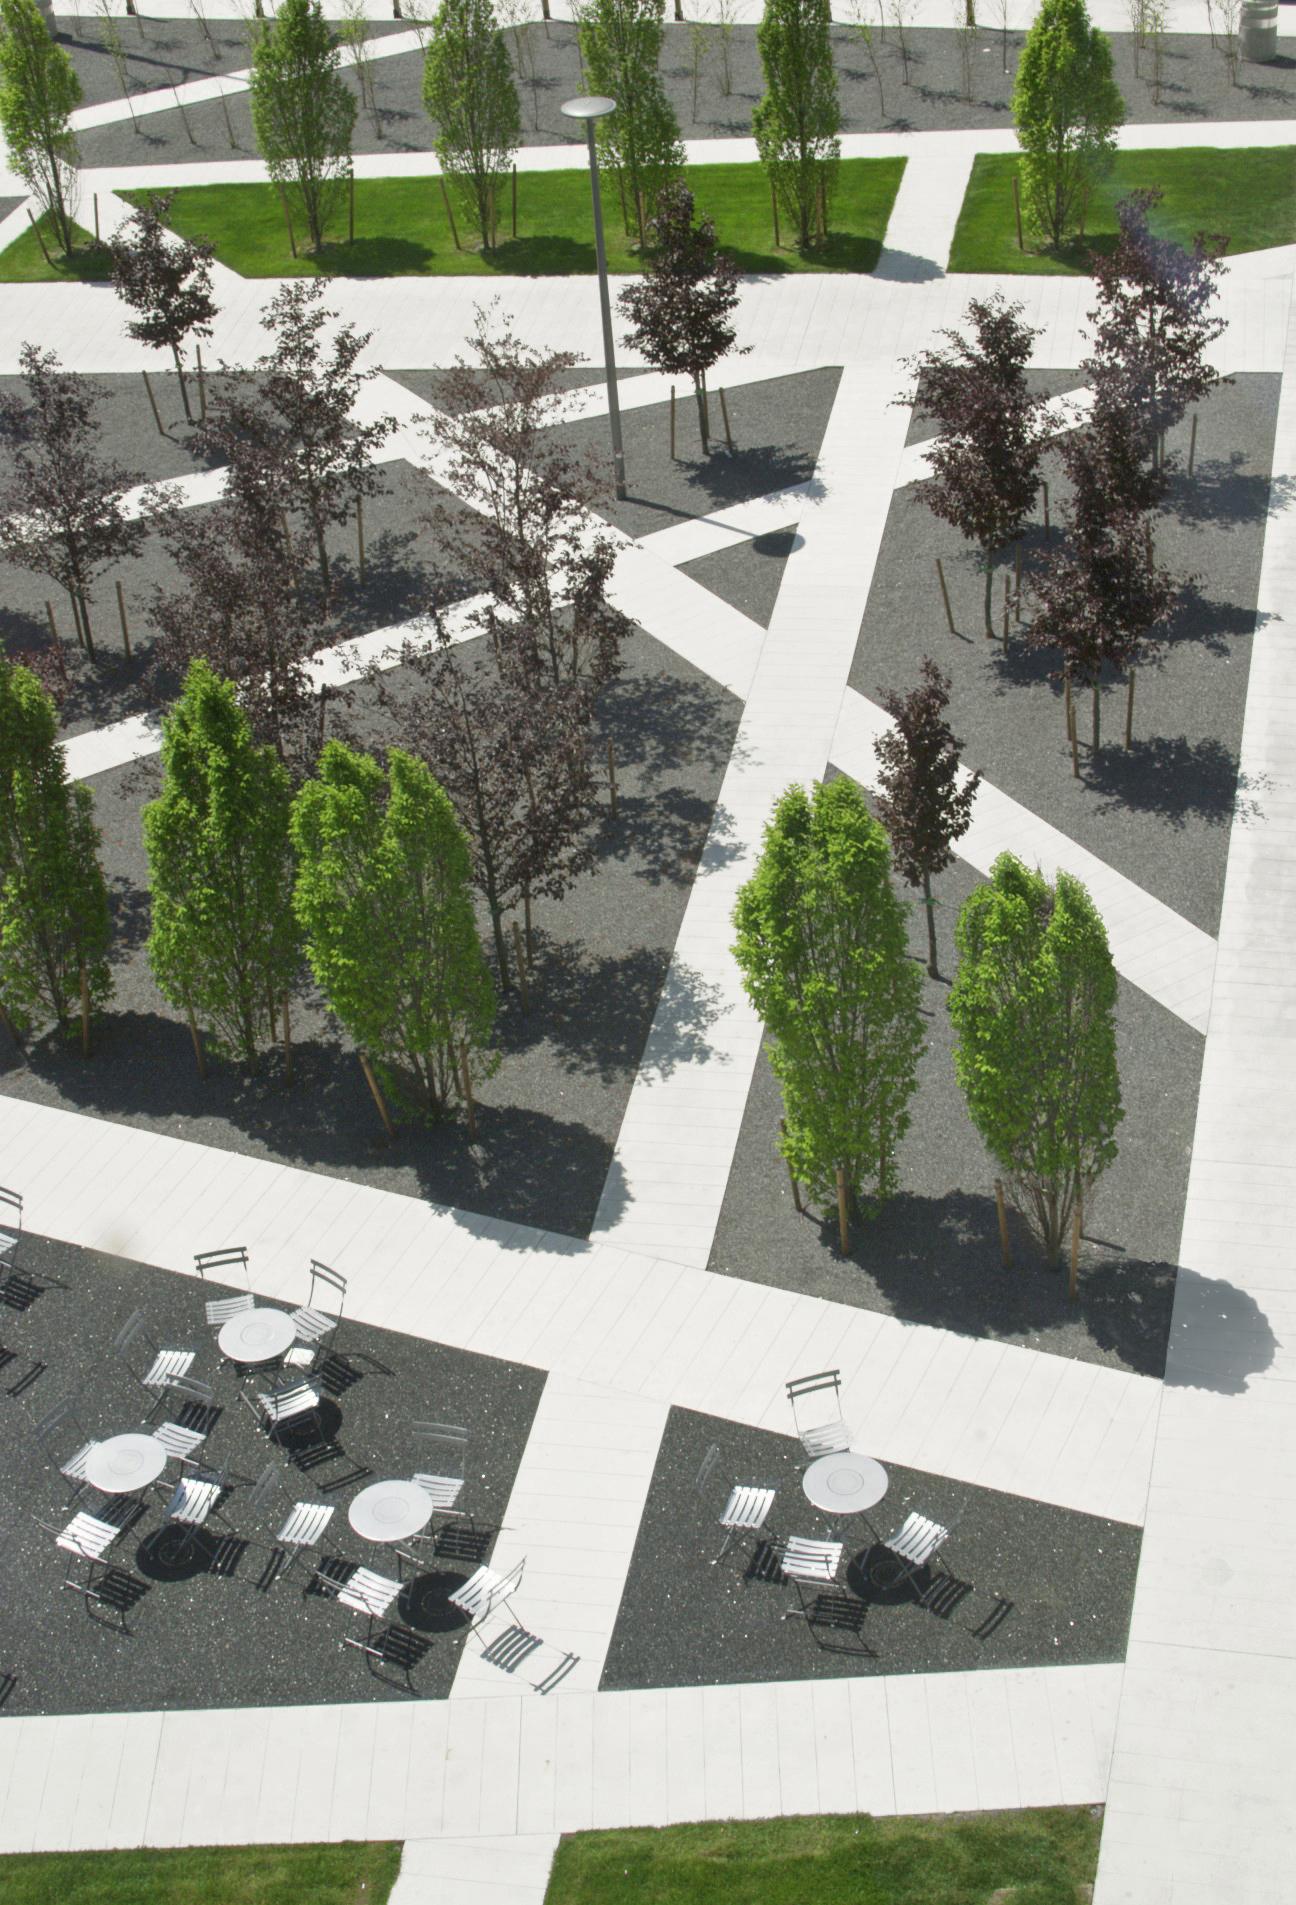 Scholars Green - Pathways Trees Dining Tables Lighting